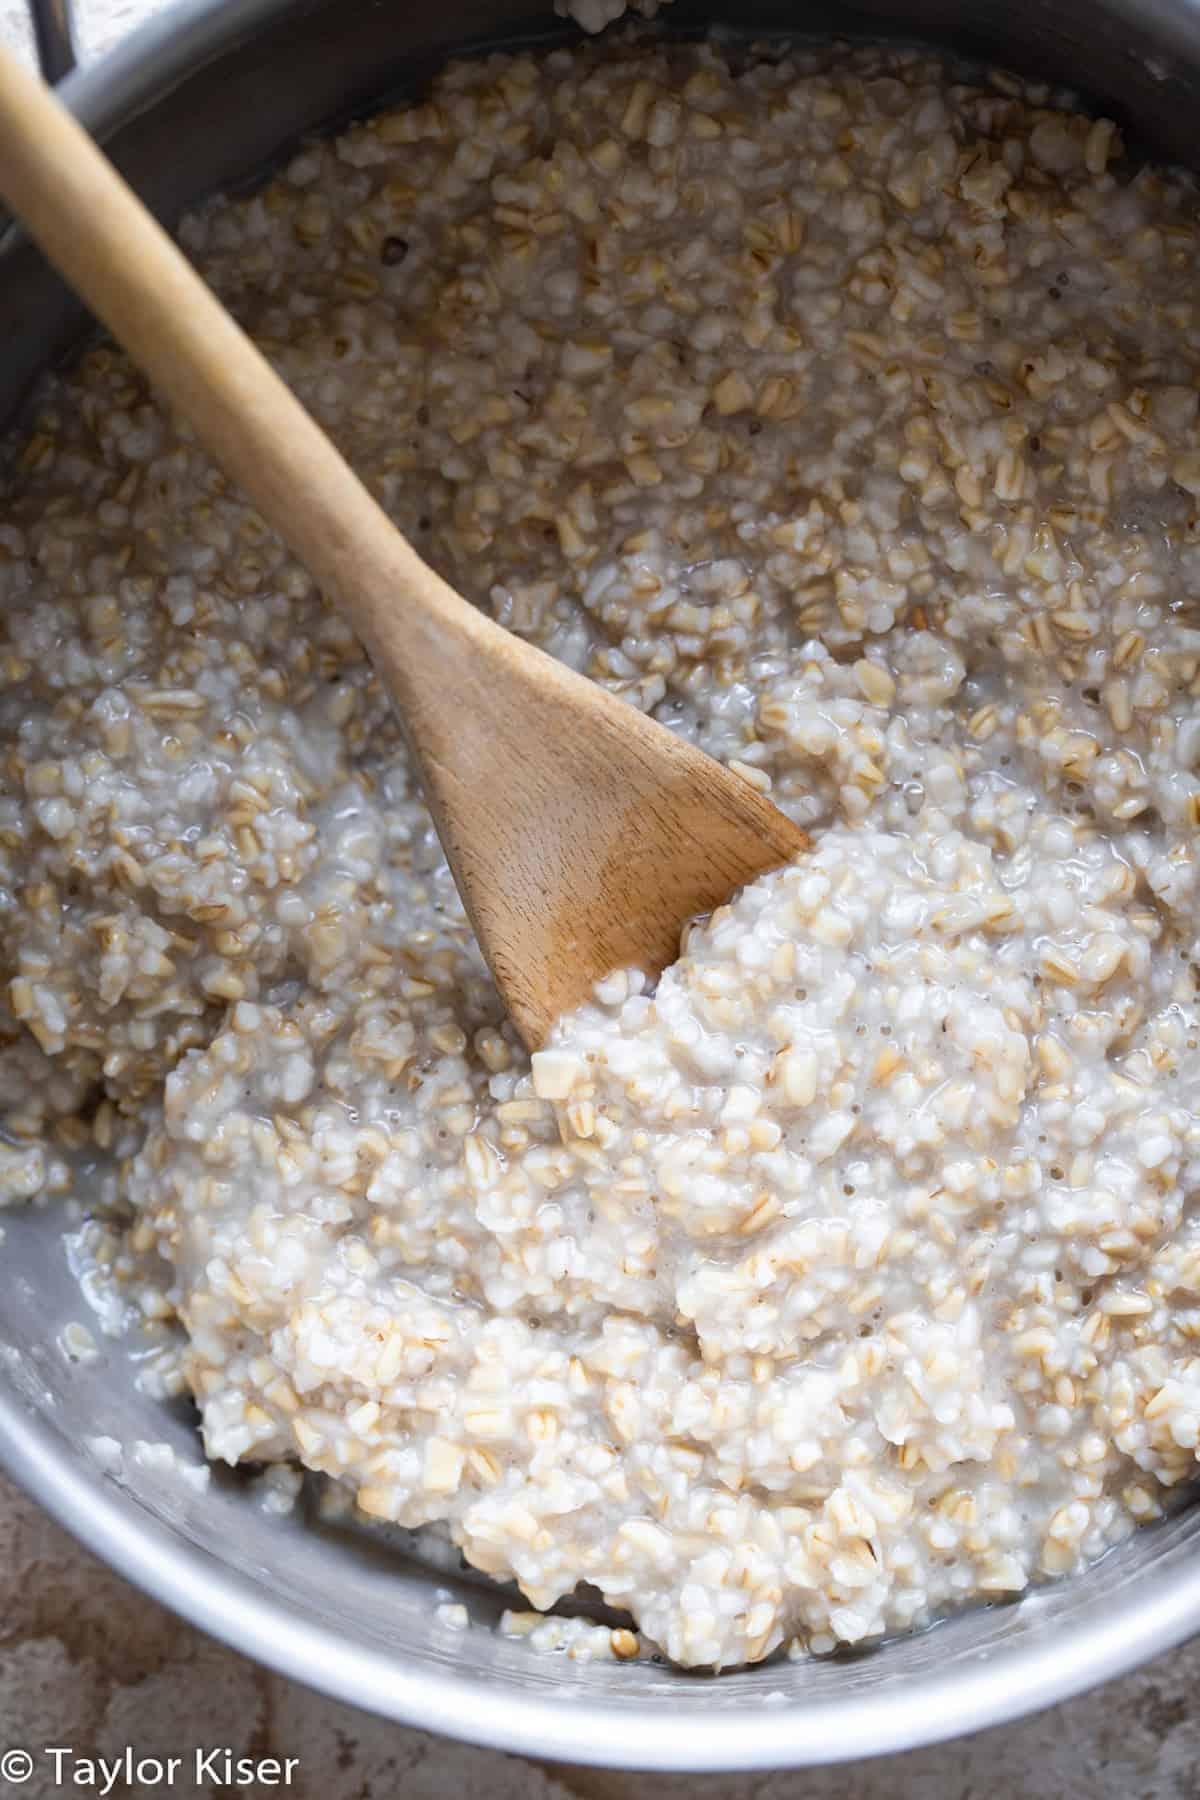 overnight oats with steel cut oats in a pot